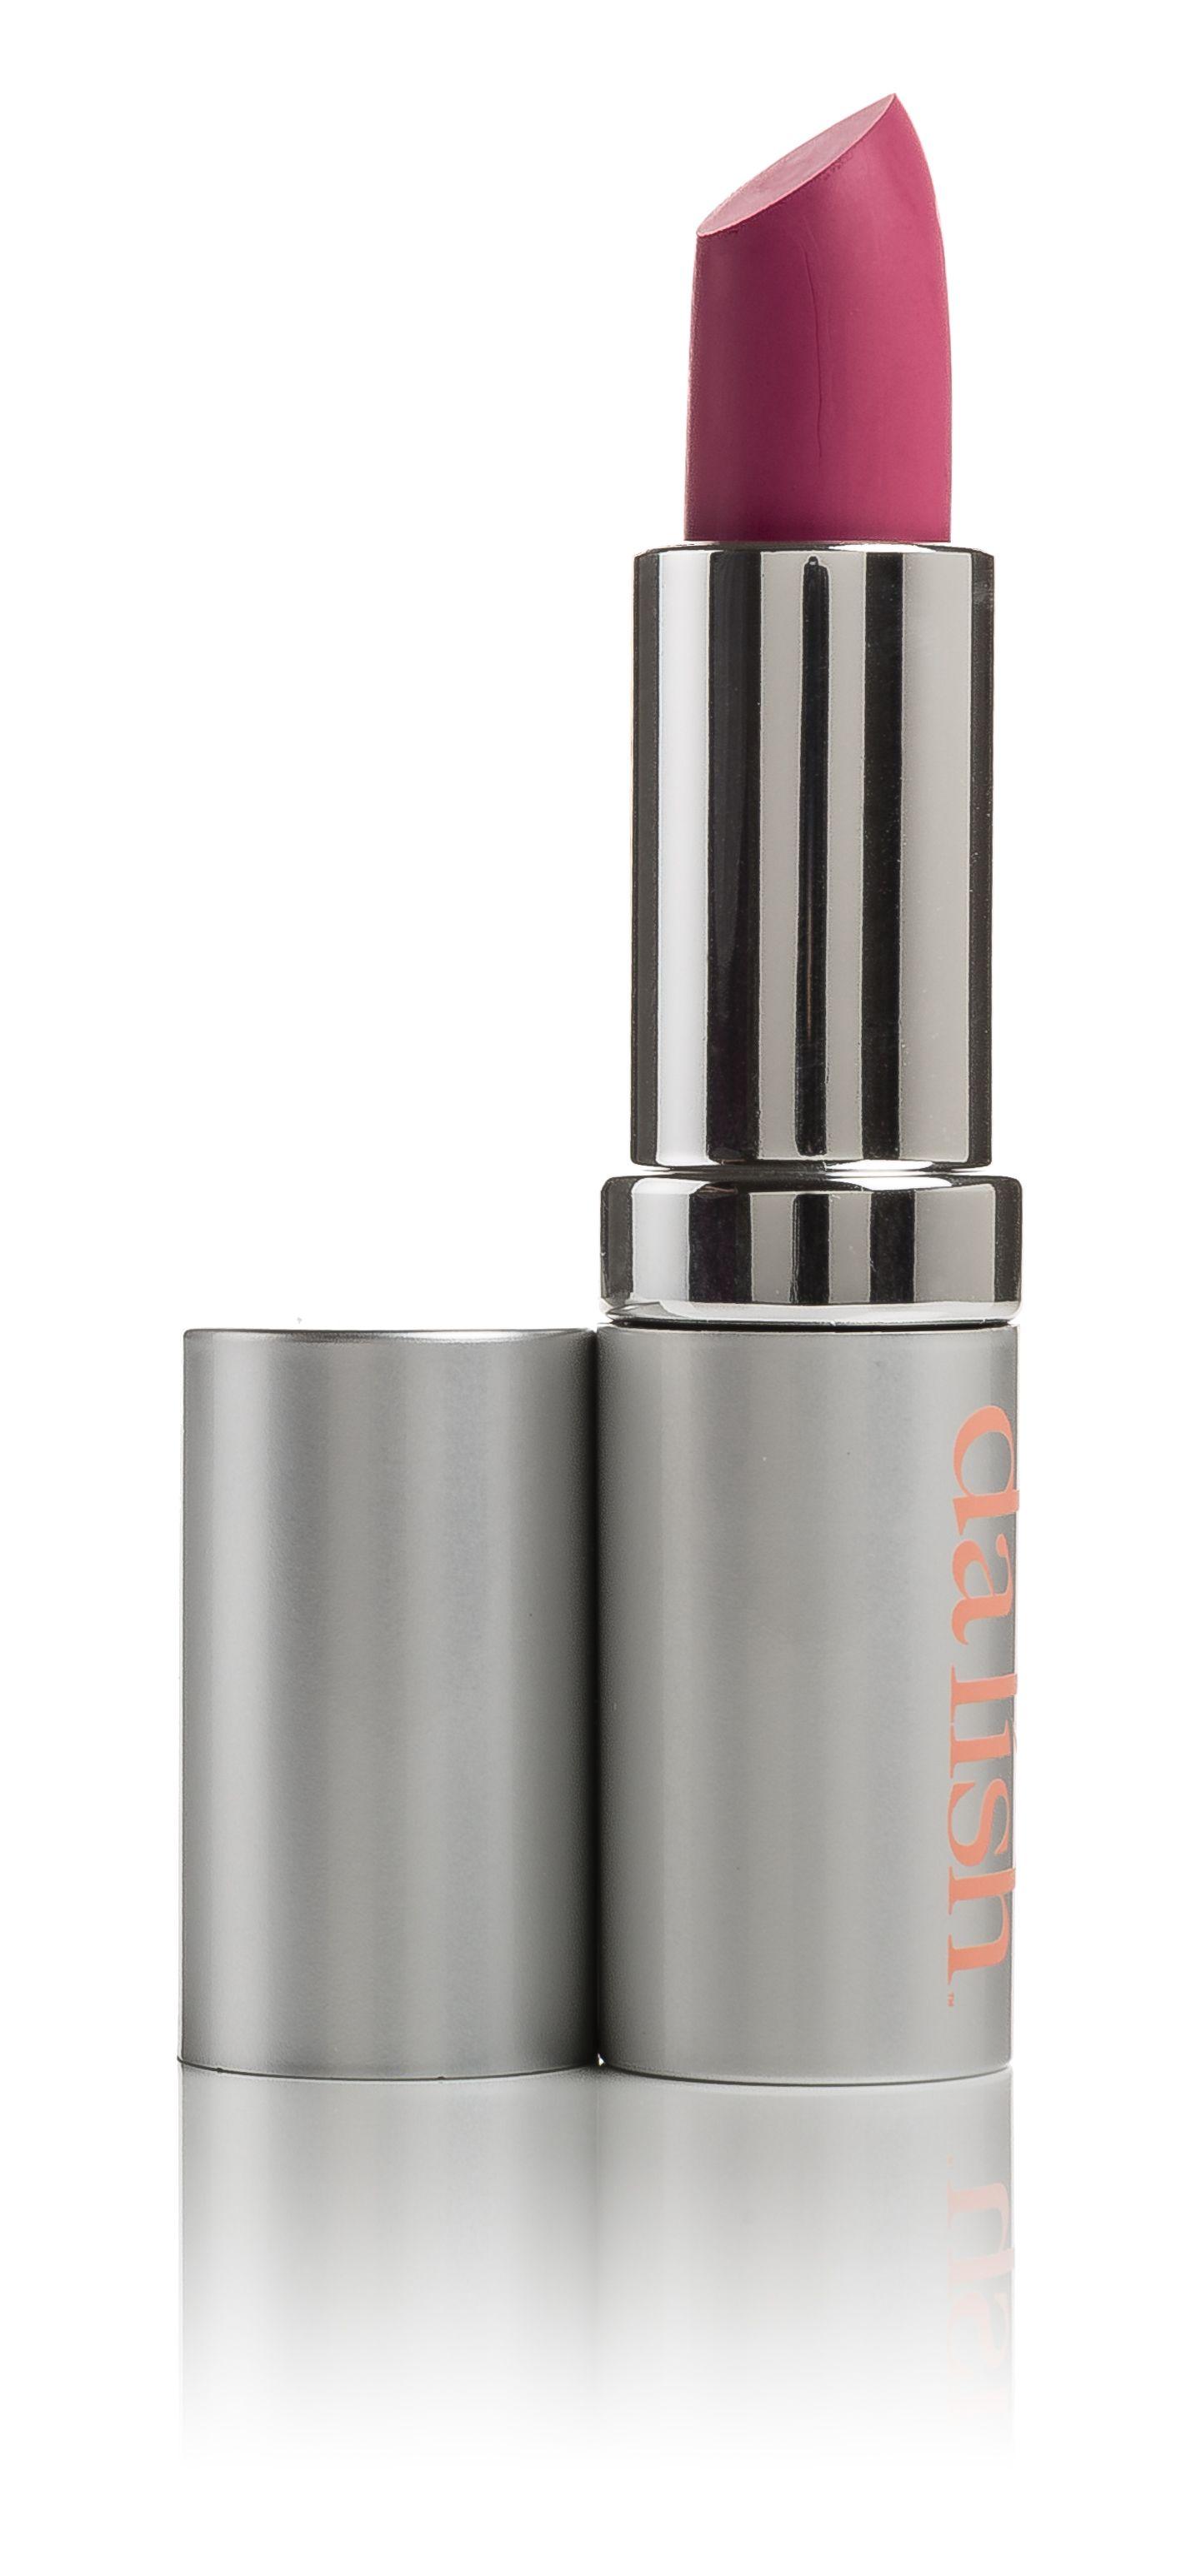 Pin by rosemary Cruickshank on Cosmetics Dark lipstick